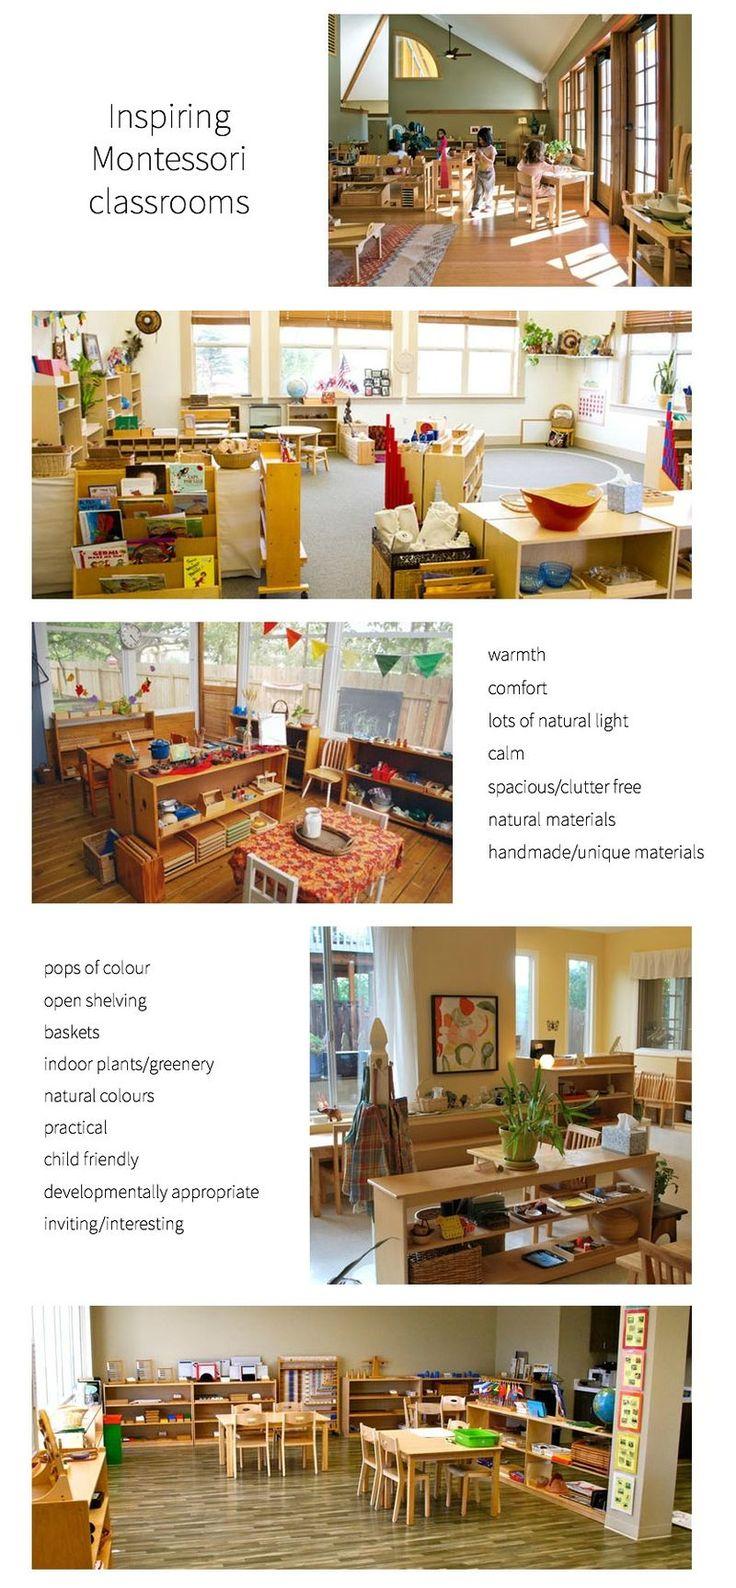 Classroom Design Companies : Best escola nova images on pinterest classroom ideas